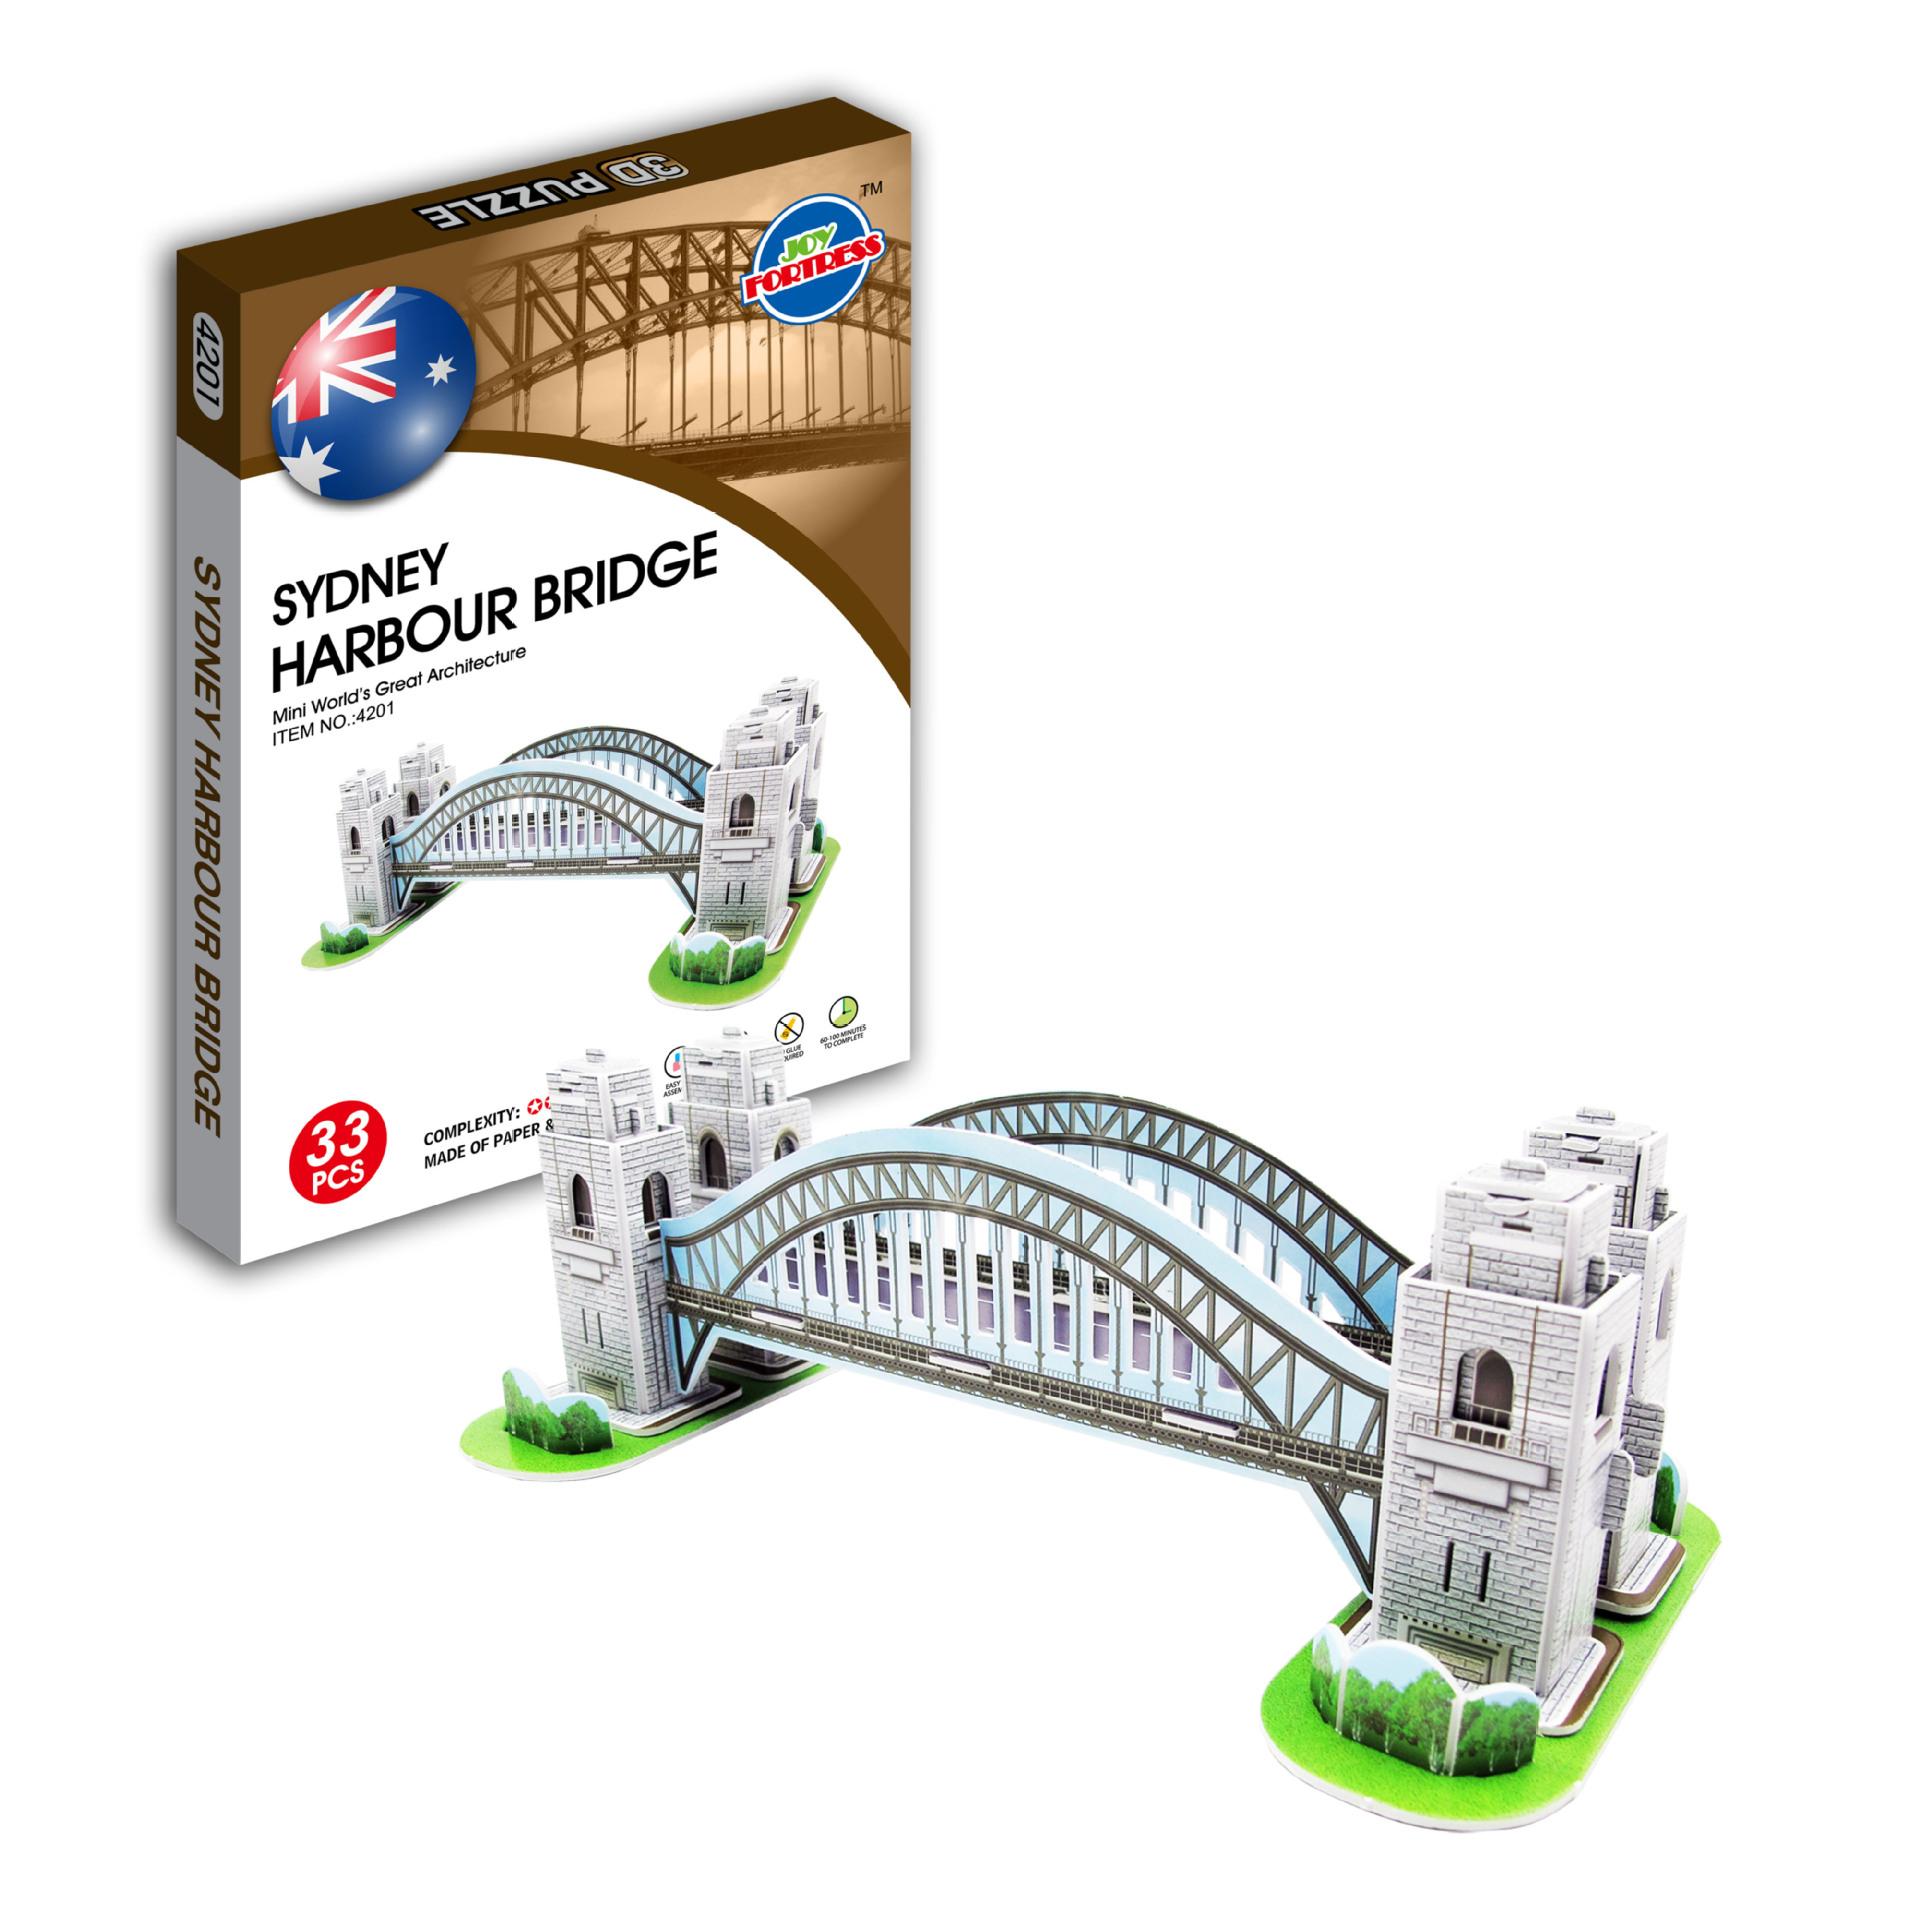 JOY FORTRESS Tranh xếp hình 3D Mini tòa nhà nổi tiếng 3D câu đố 3D PUZZLE chất lượng cao